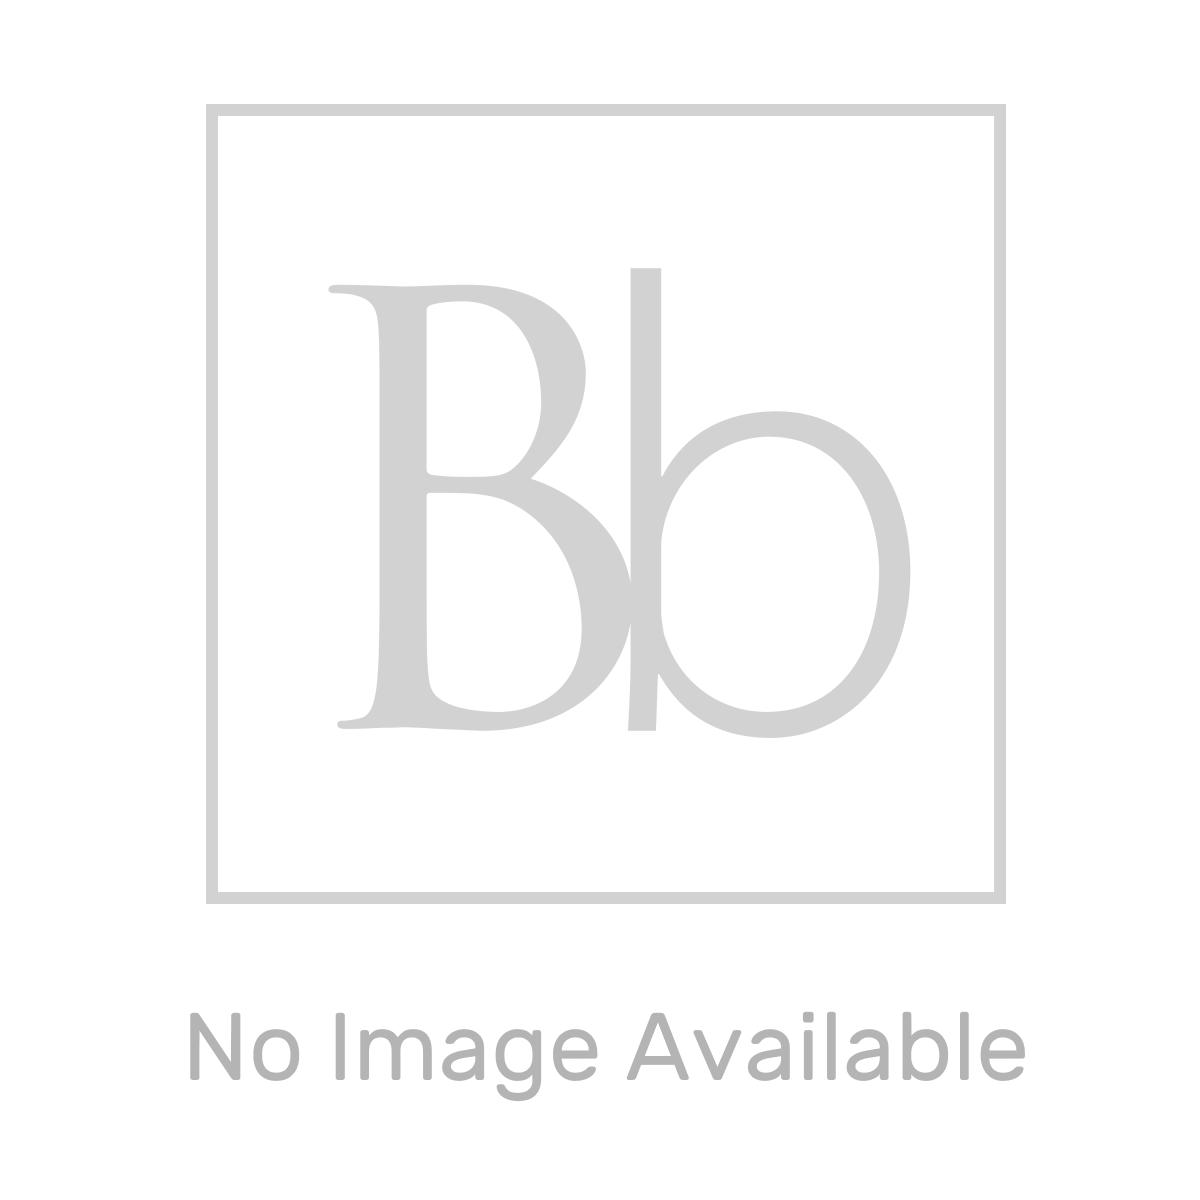 RAK Surface Ash Rustic Tile 600 x 600mm